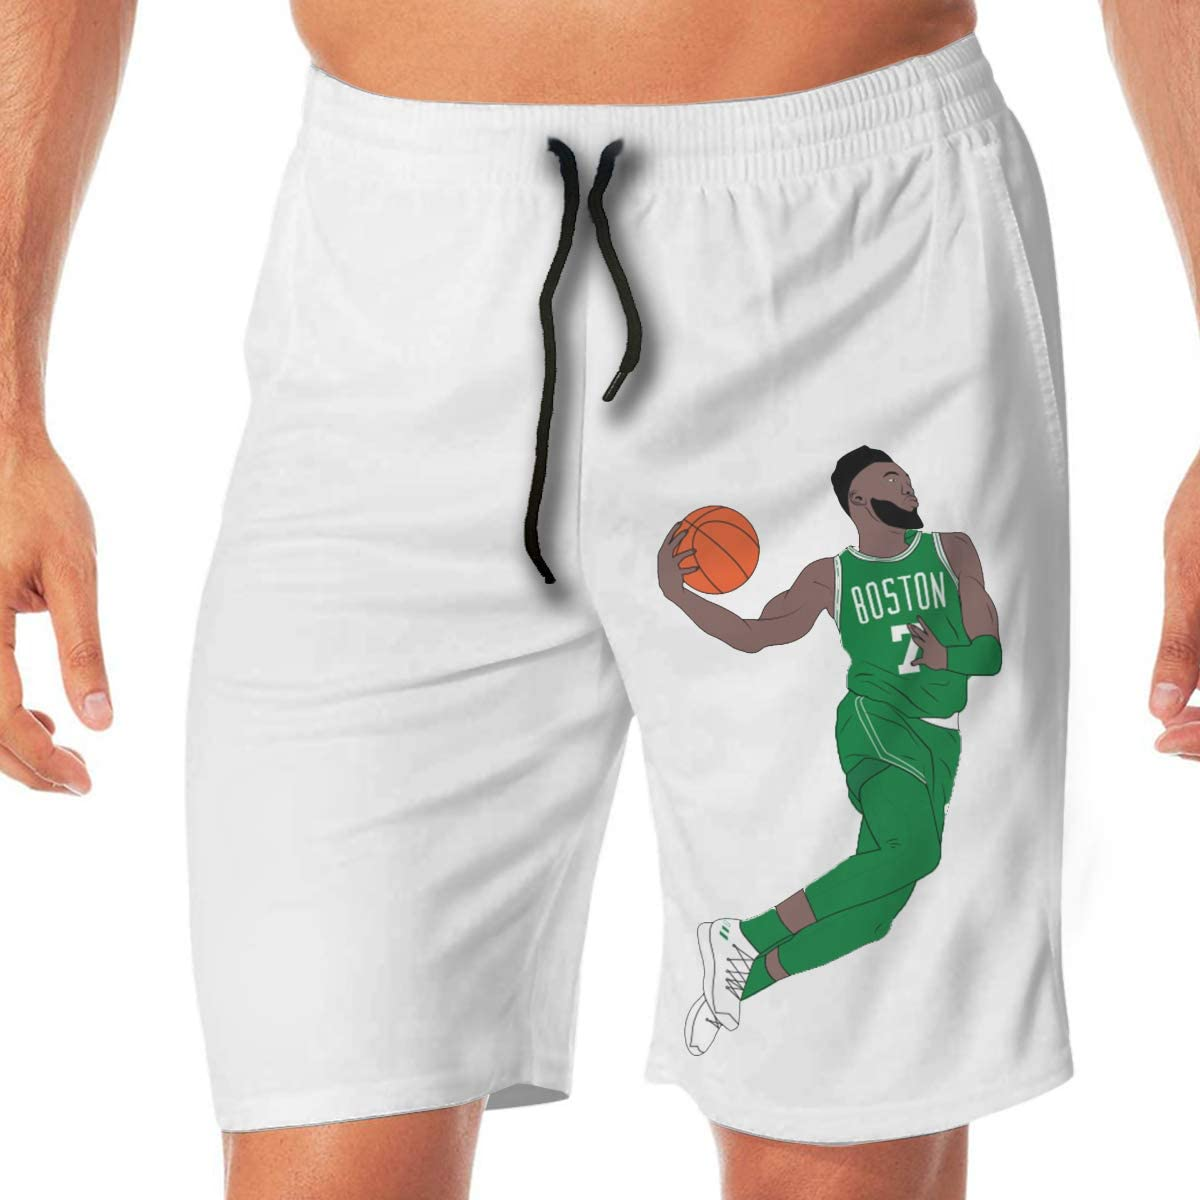 Brown Basketball Casual Sport Beach Shorts Quick-Dry Board Shorts Reynoldss Caraaed Mens Cartoon Jay